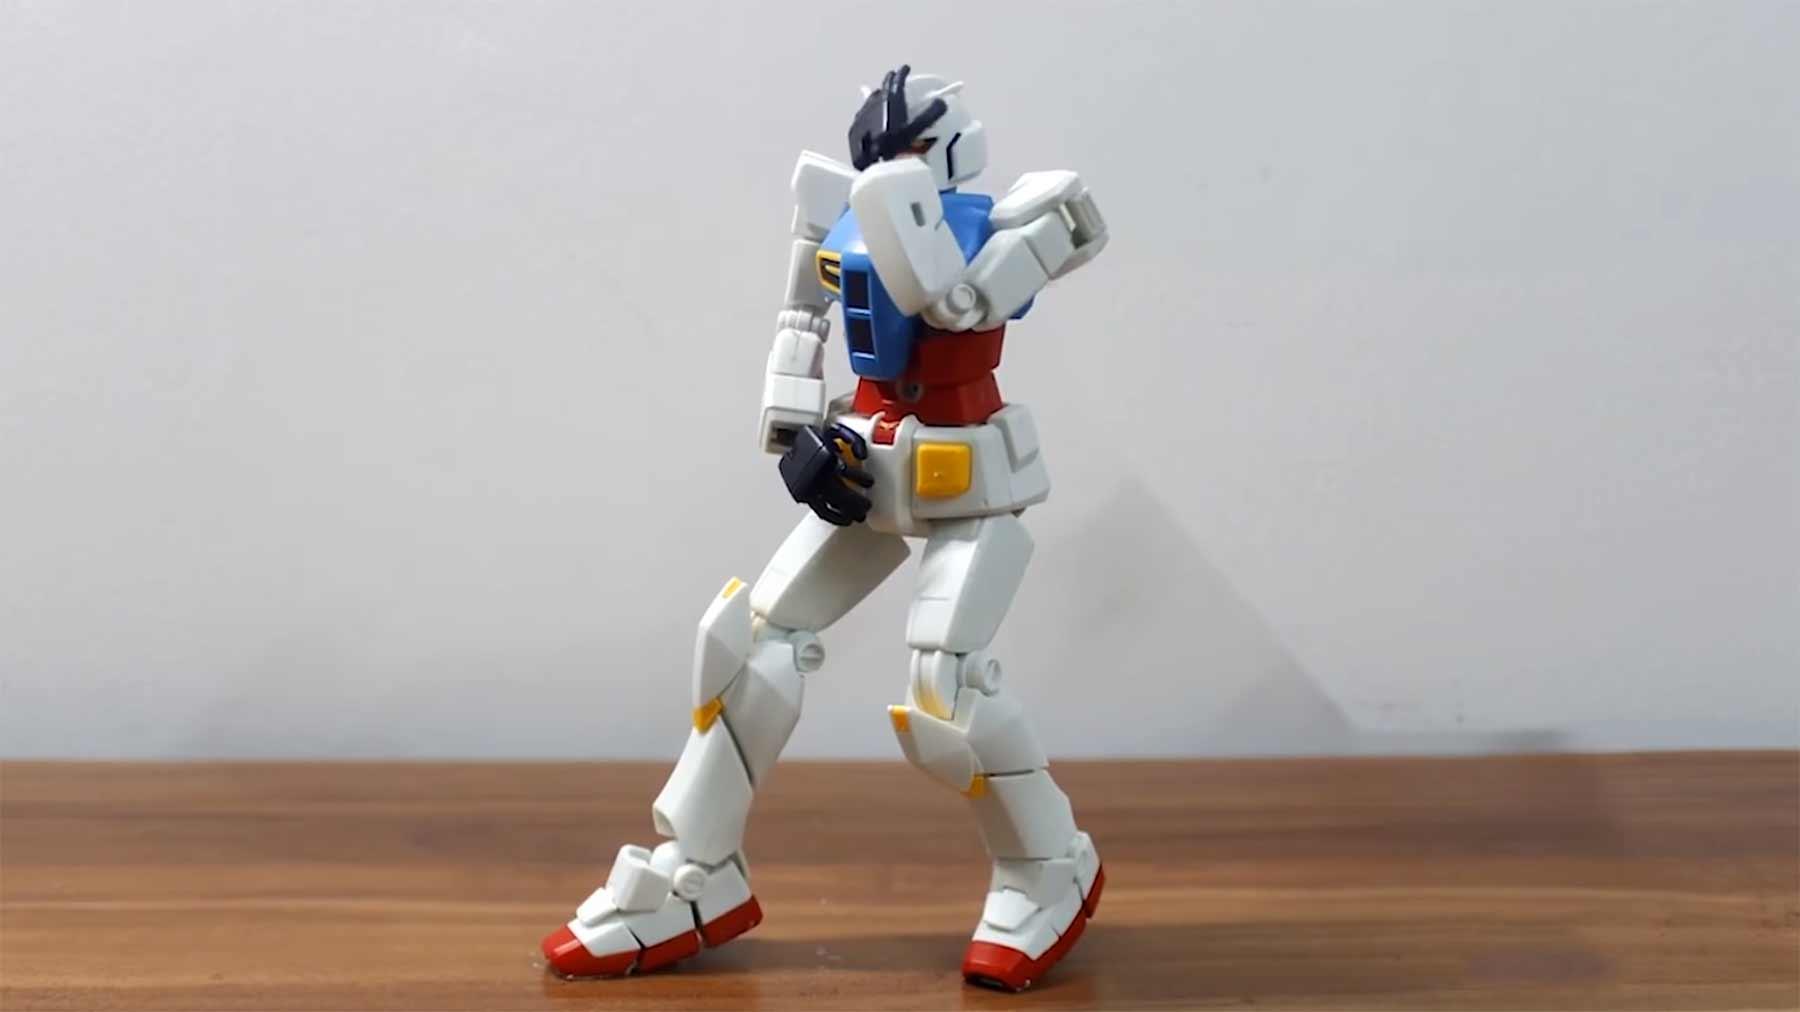 Gundam-Roboter tanzt Michael-Jackson-Moves